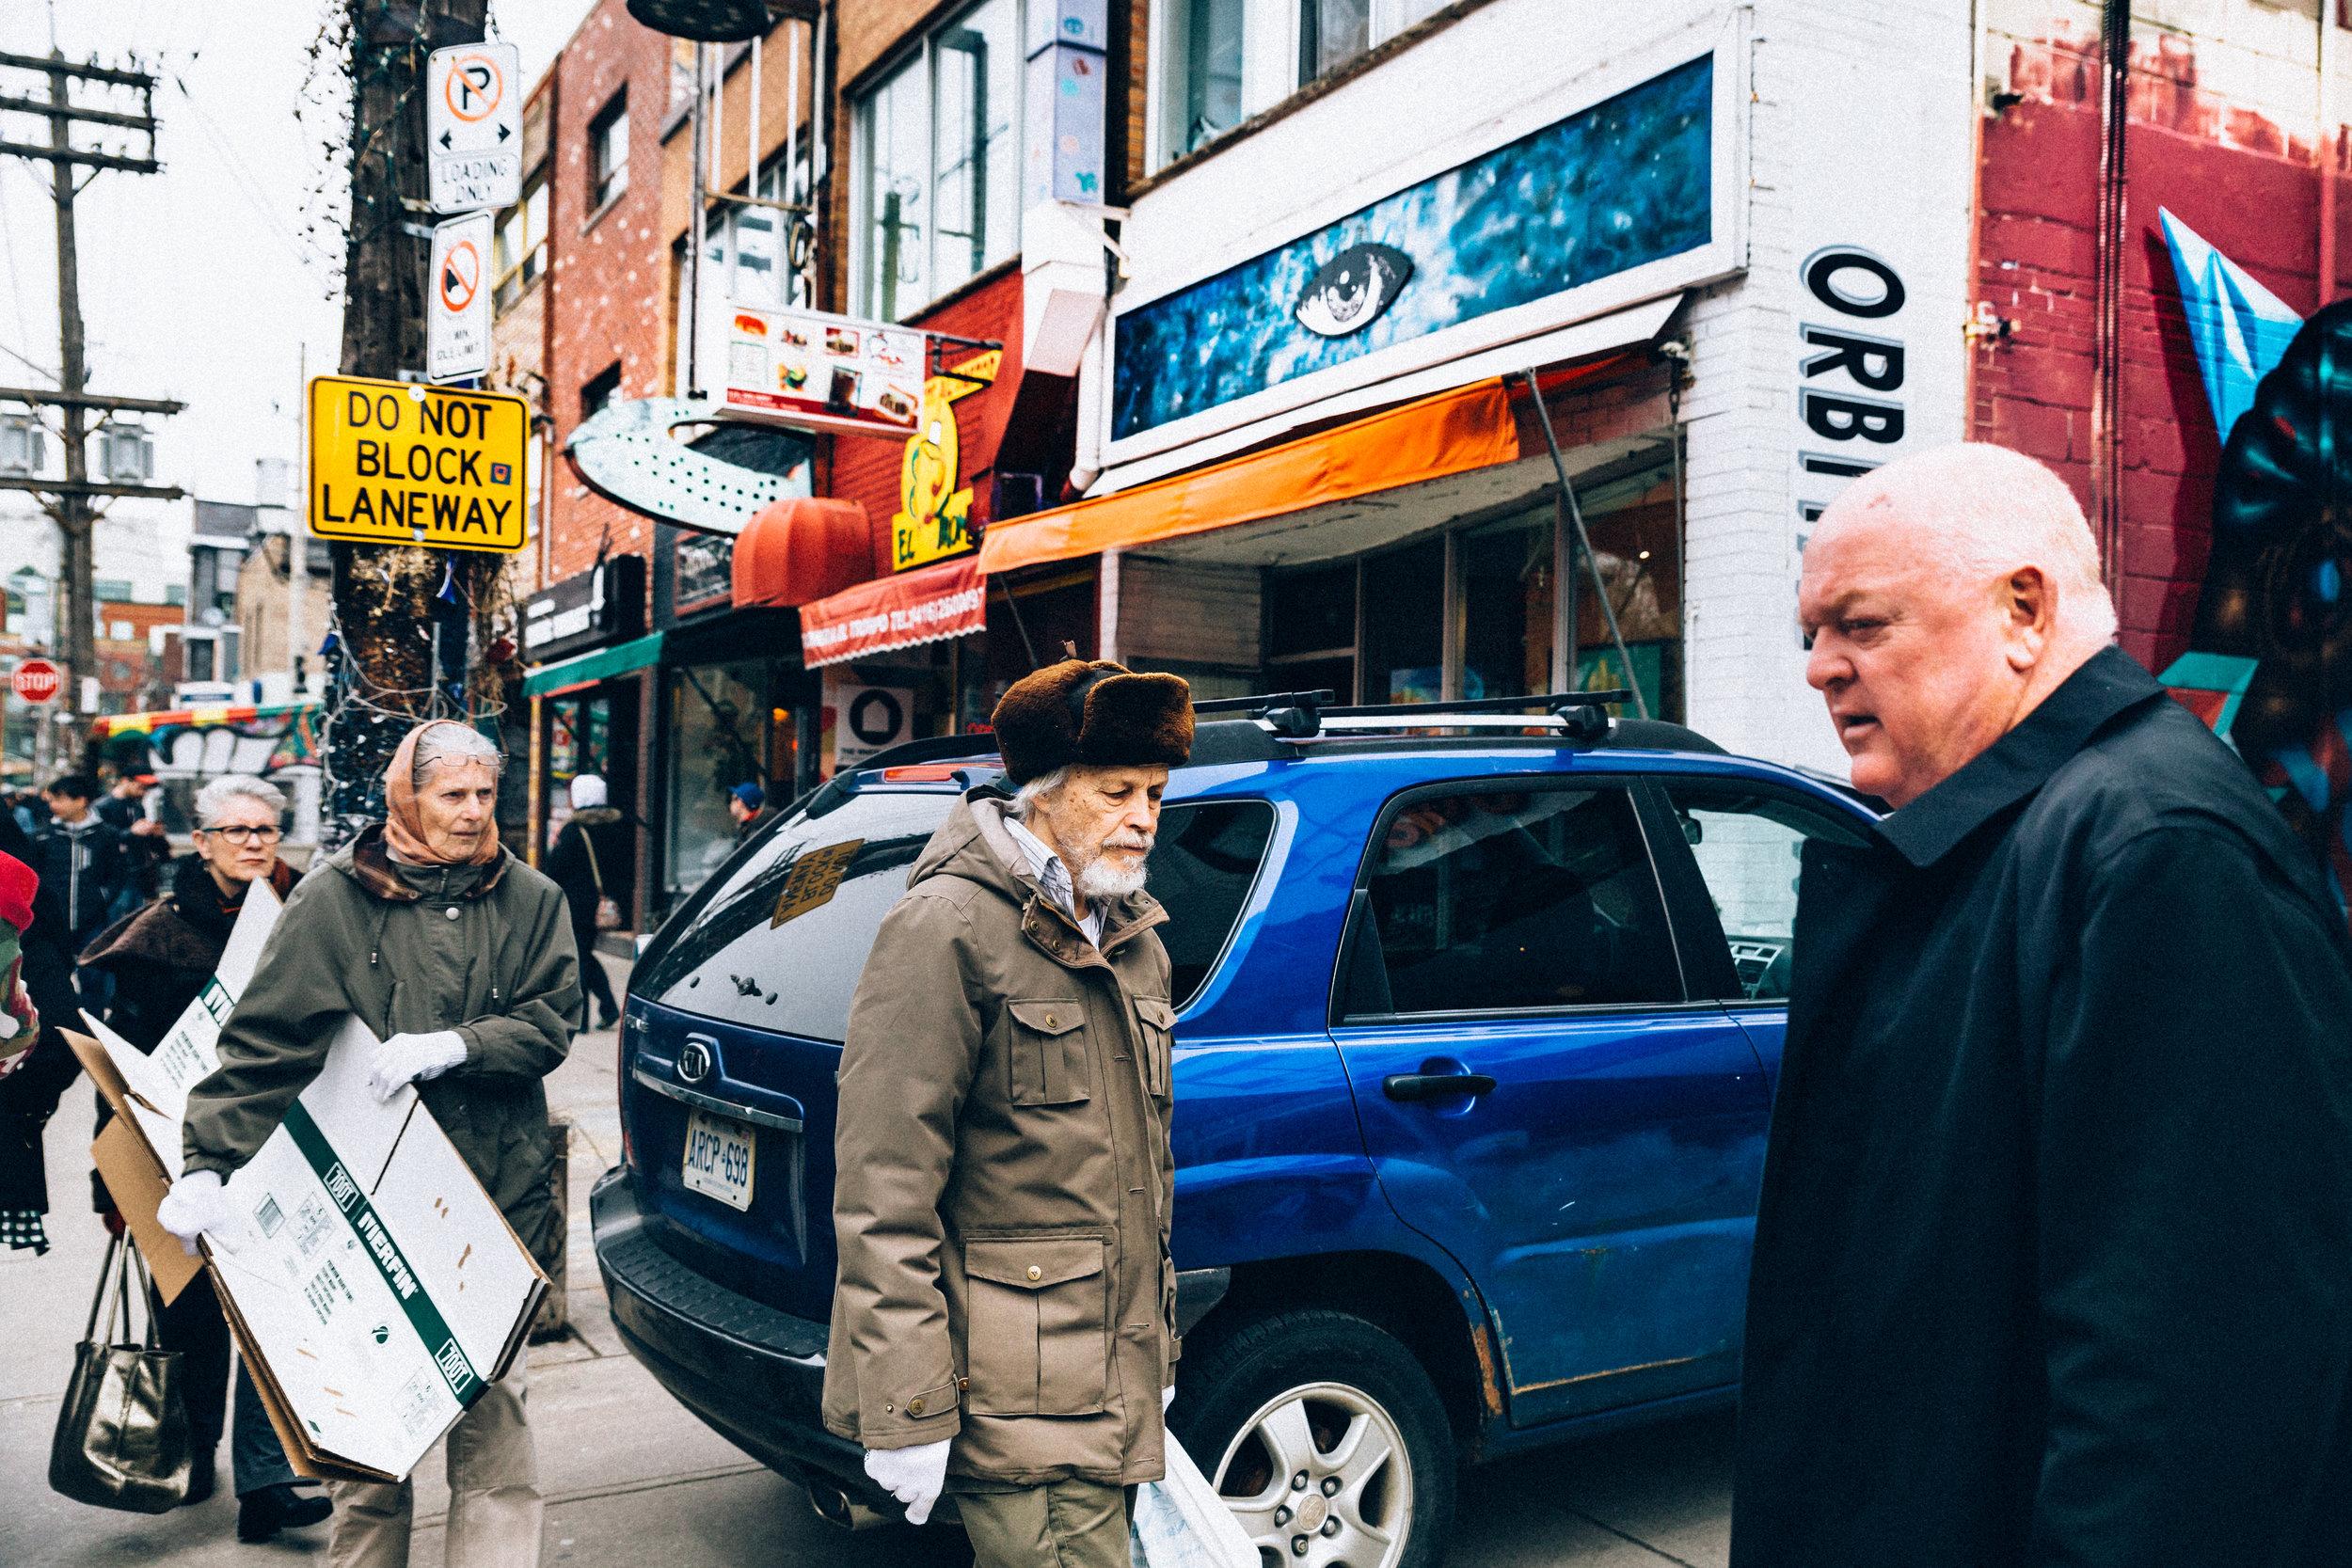 Toronto adrian morillo_photography-6.JPG